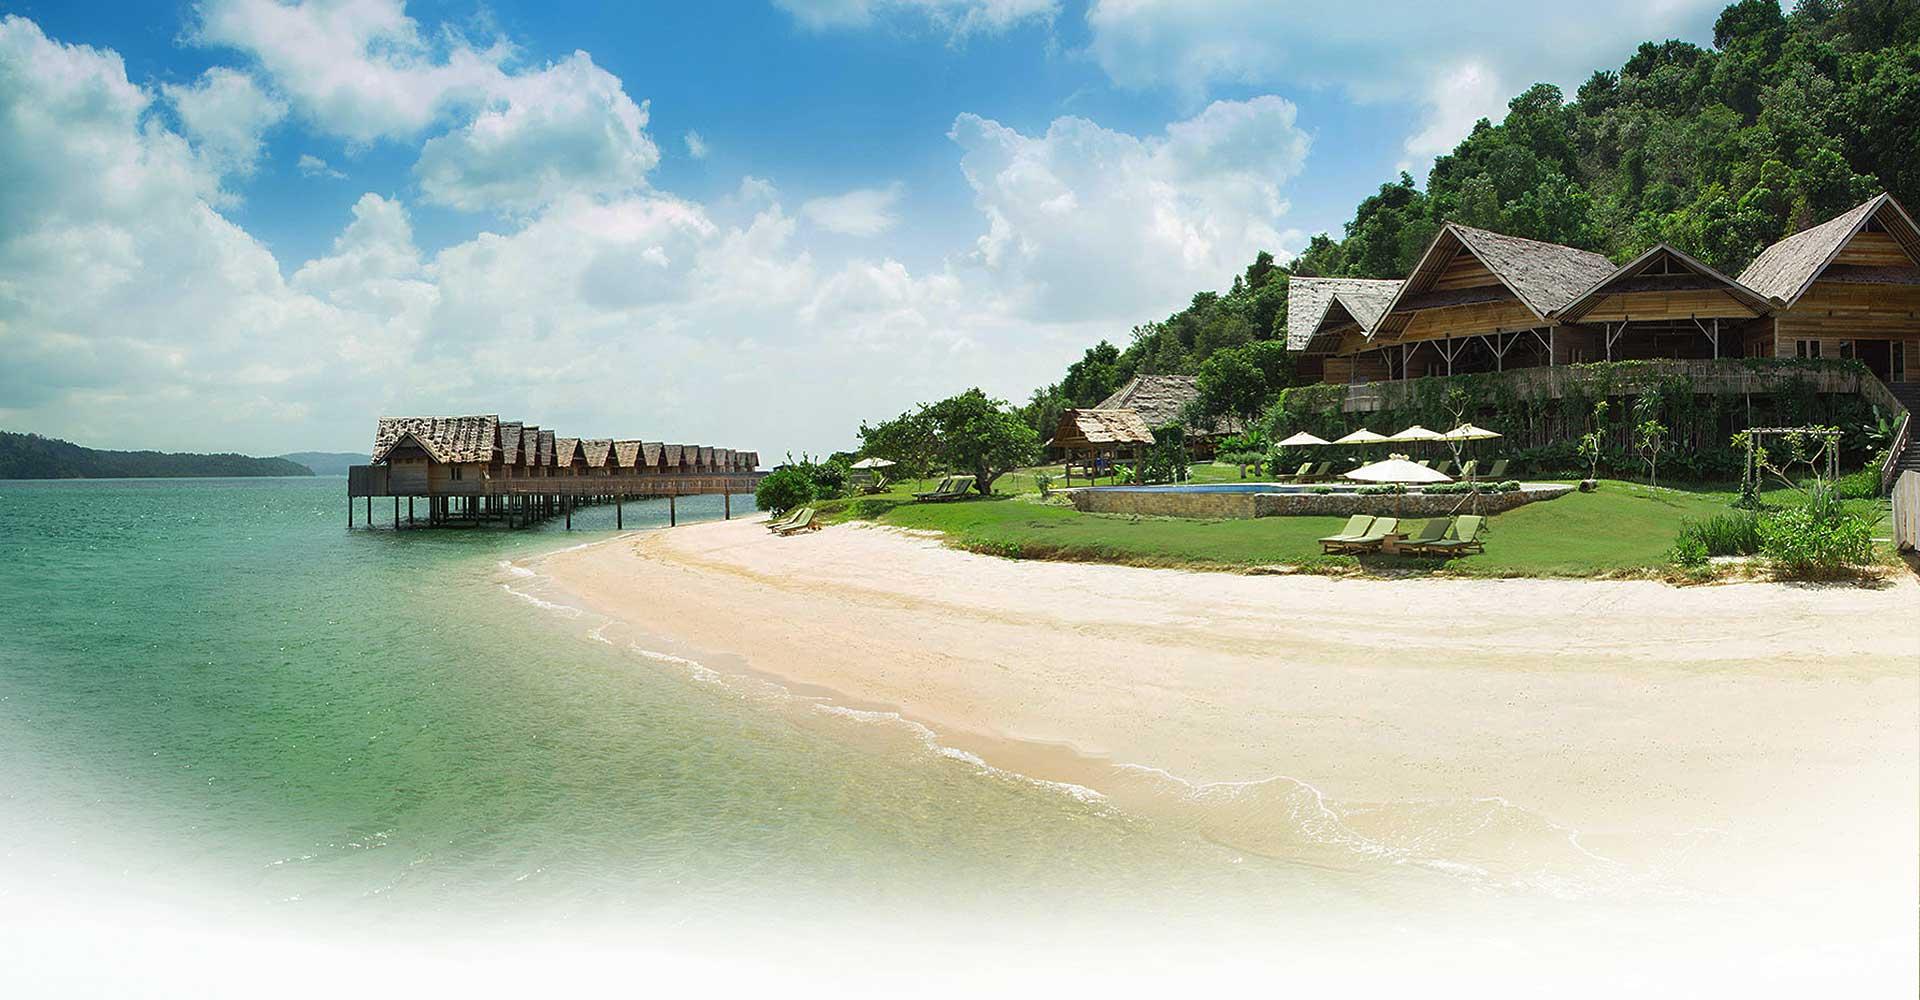 Telunas Private Island Rates - Private Island and Beach Resort Near